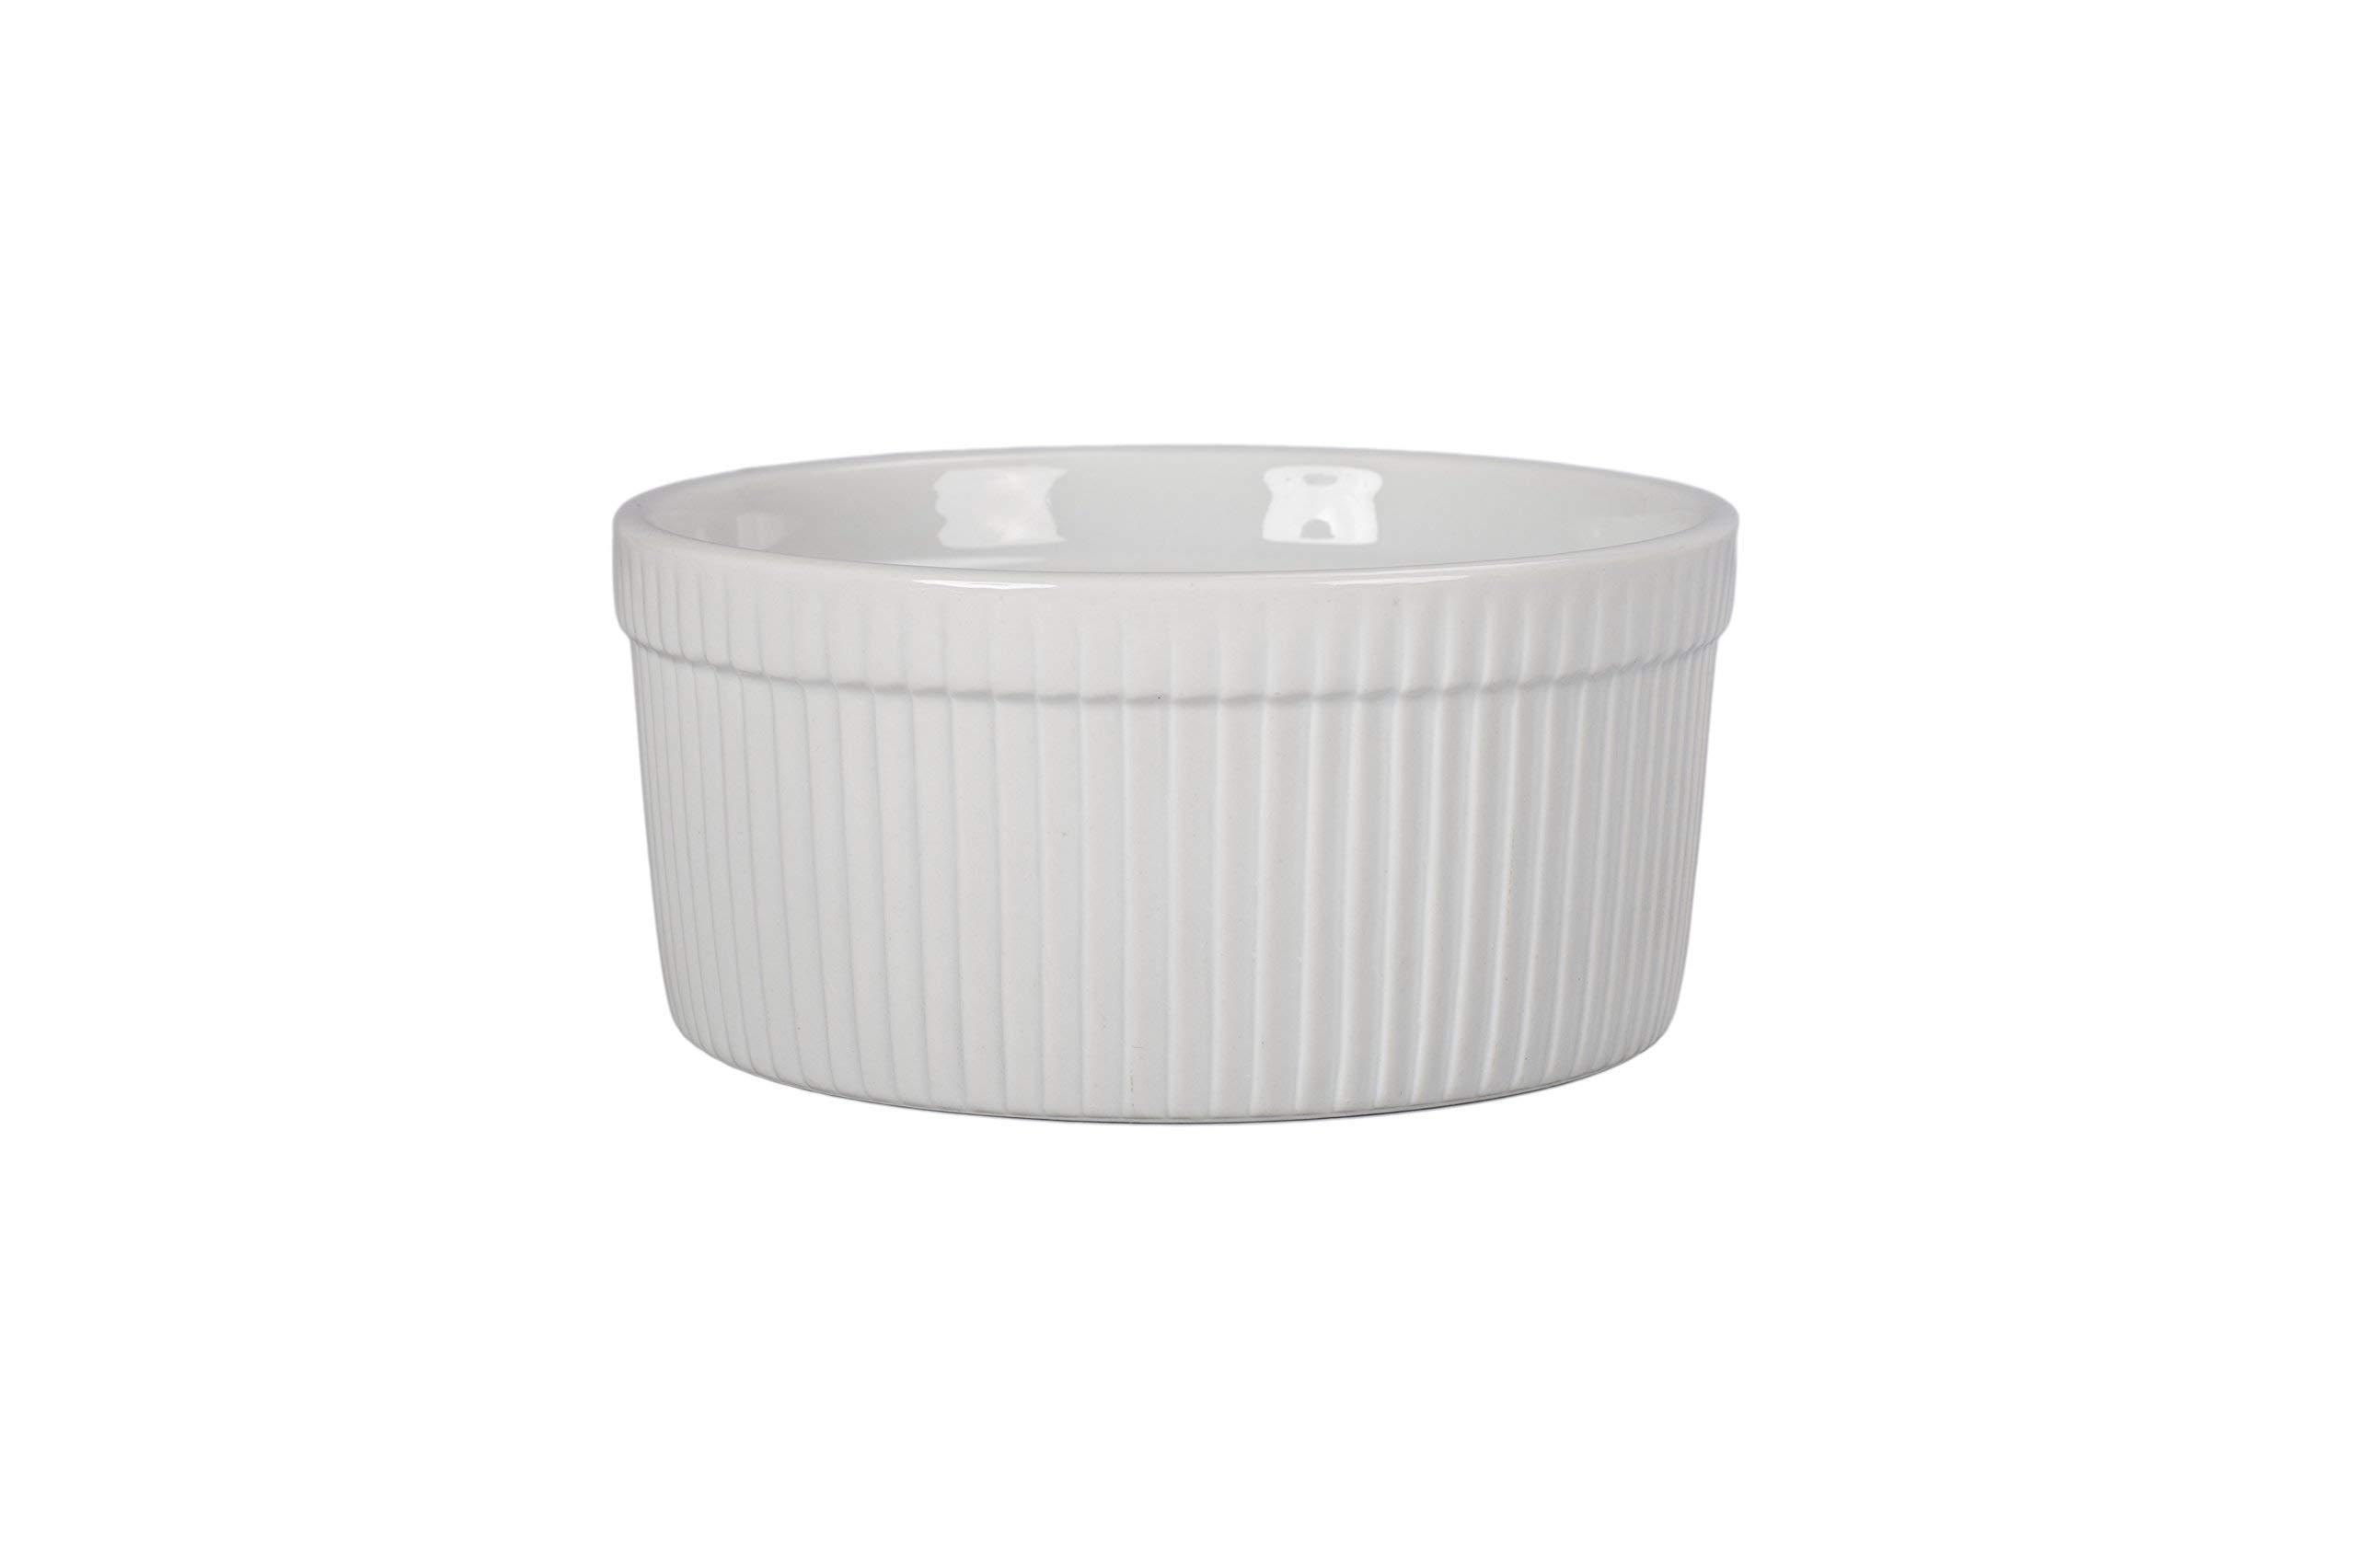 BIA Cordon Bleu 900016S1SIOC Classic Bakeware Souffle Dish White (Renewed) by BIA Cordon Bleu